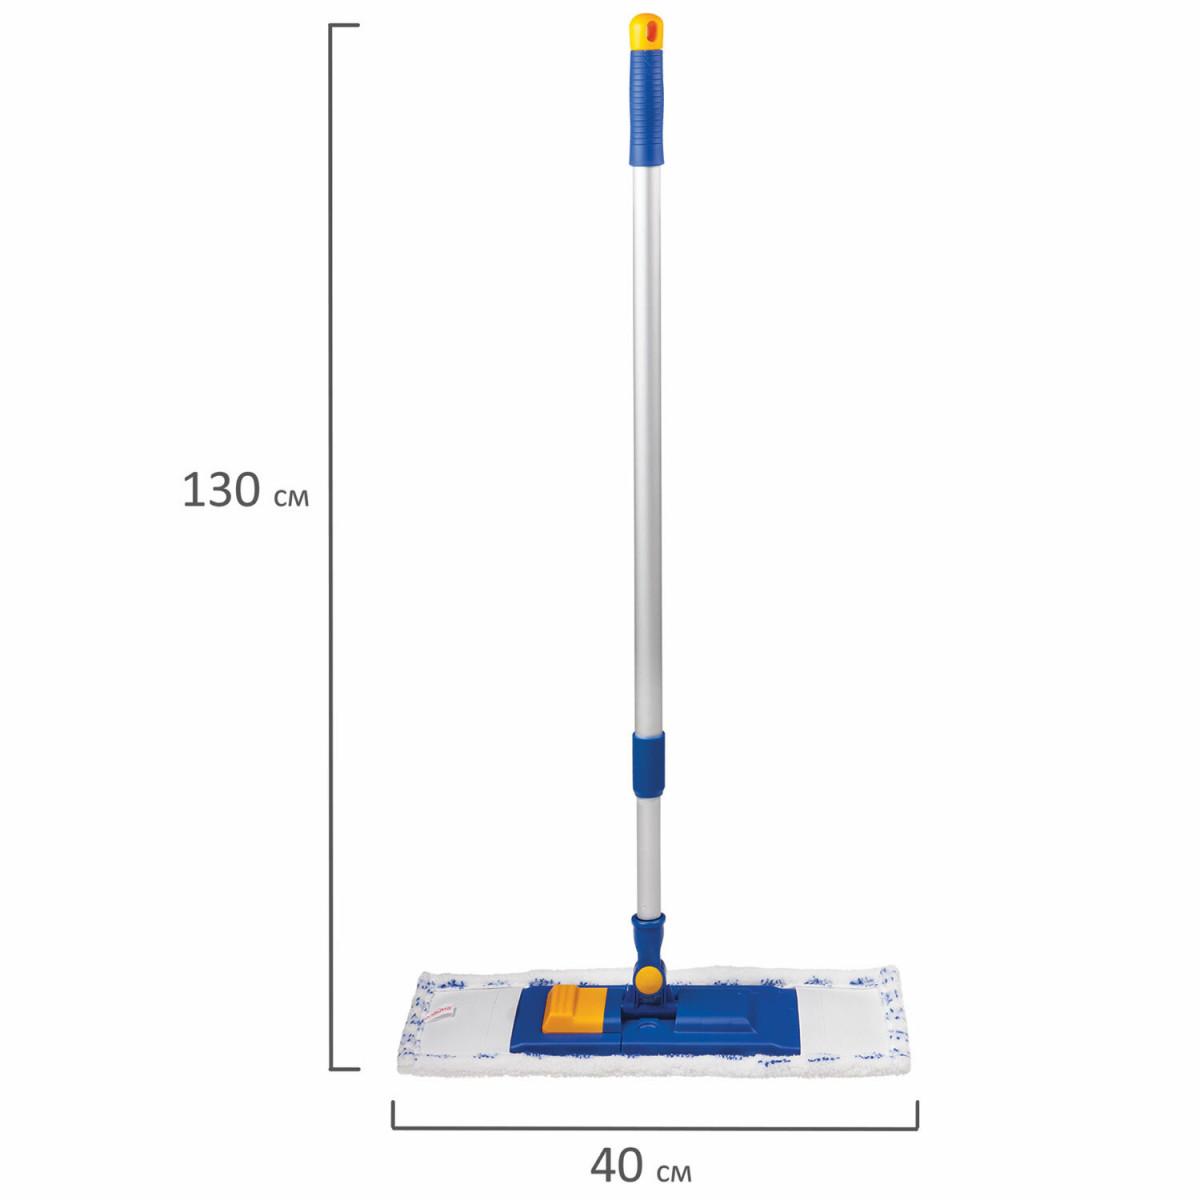 Швабра с флаундером 40 см, телескопический черенок 130 см, резьба 1,6 см, микрофибра/абразив (ТИП К), LAIMA, 601462 (арт. 601462)